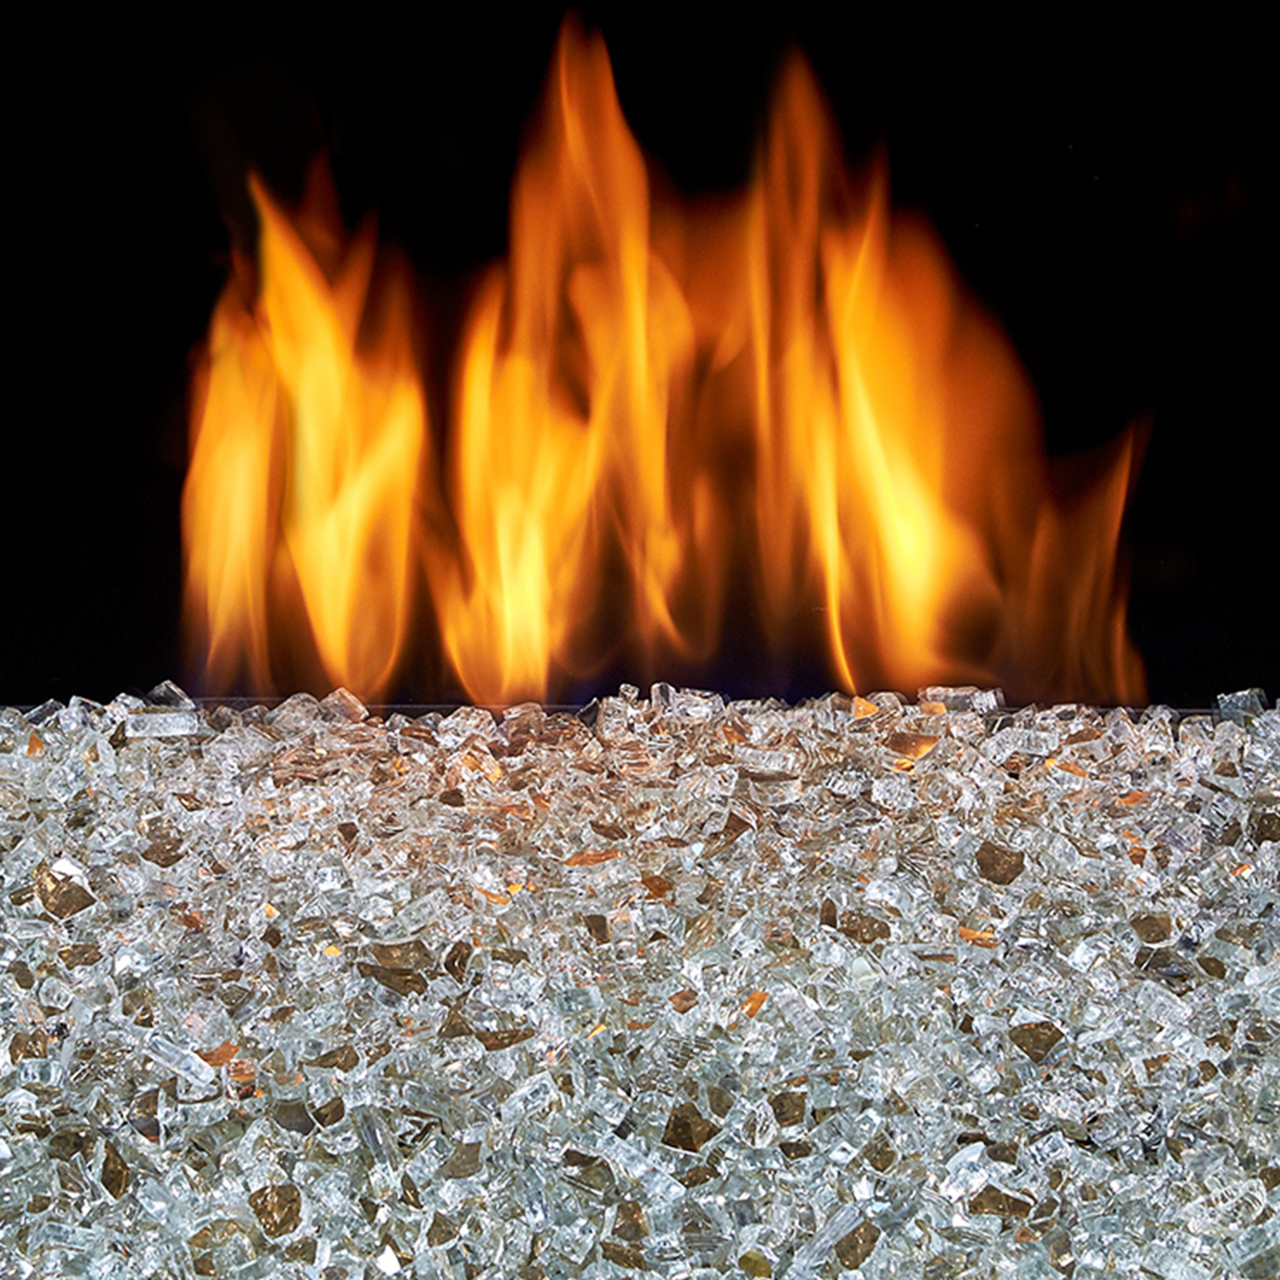 Duluth Forge Vented Fire Glass Burner Kit 18in 55 000 Btu